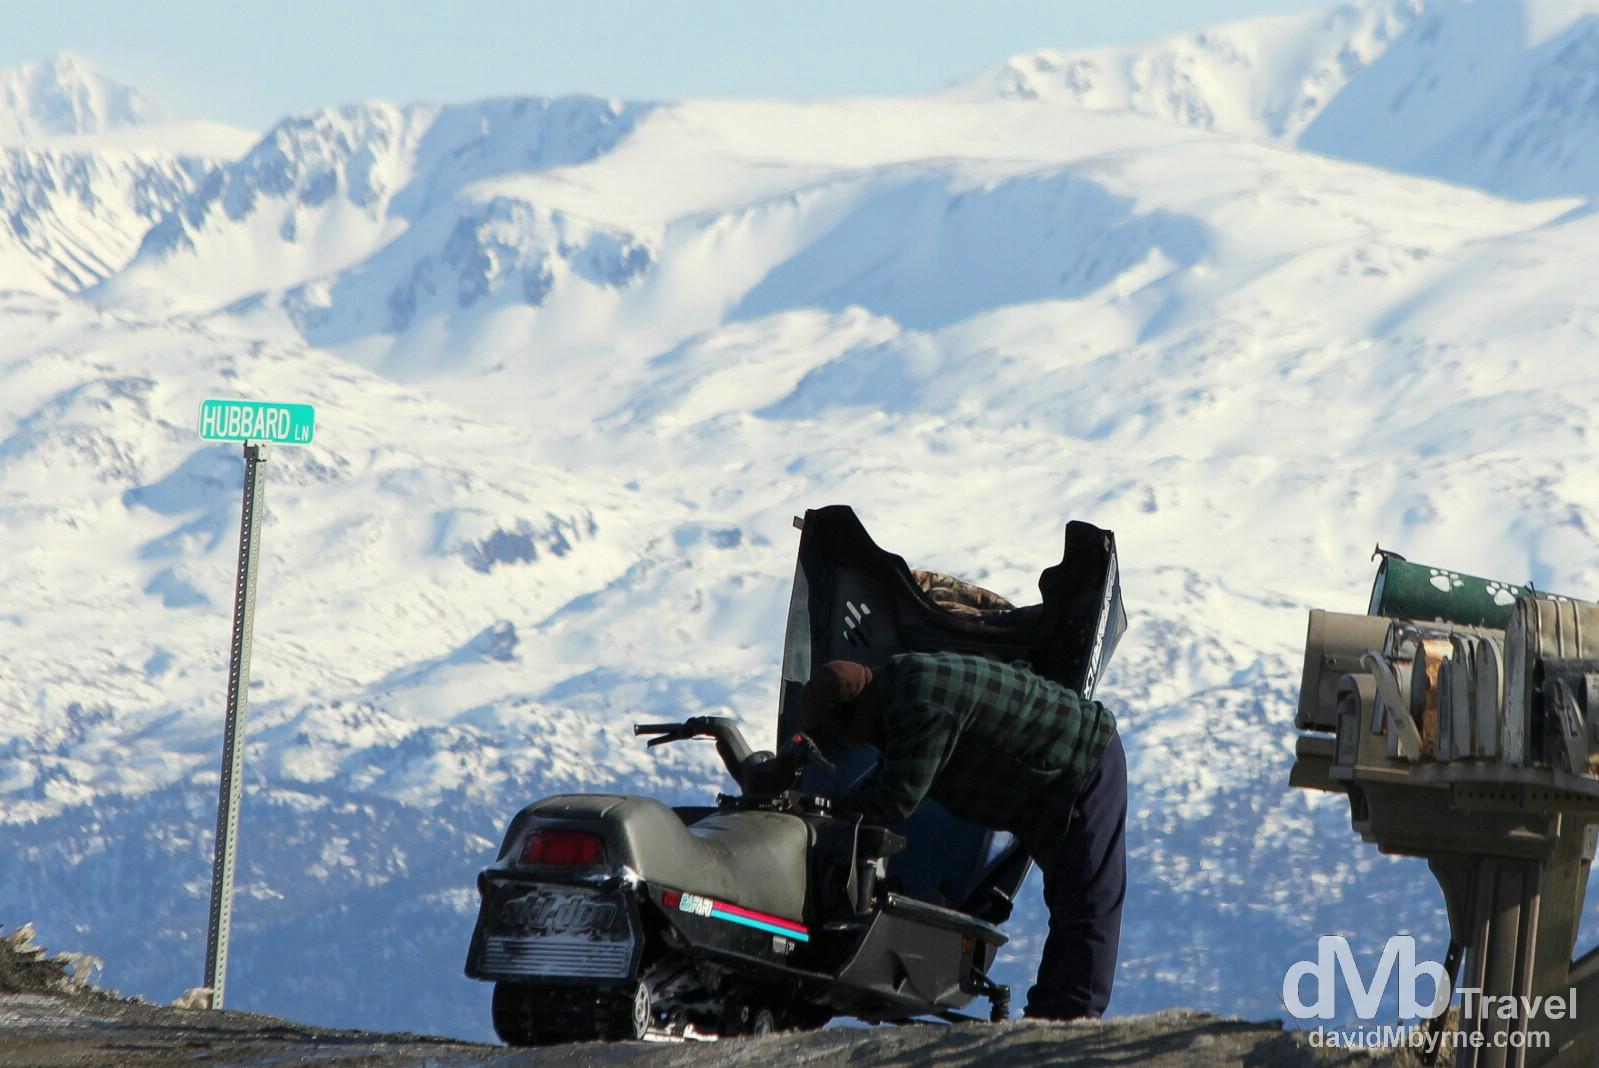 Tending to a snowmobile near Hubbard Lane on Skyline Drive, Homer, Kenai Peninsula, Alaska, USA. March 17th 2013.